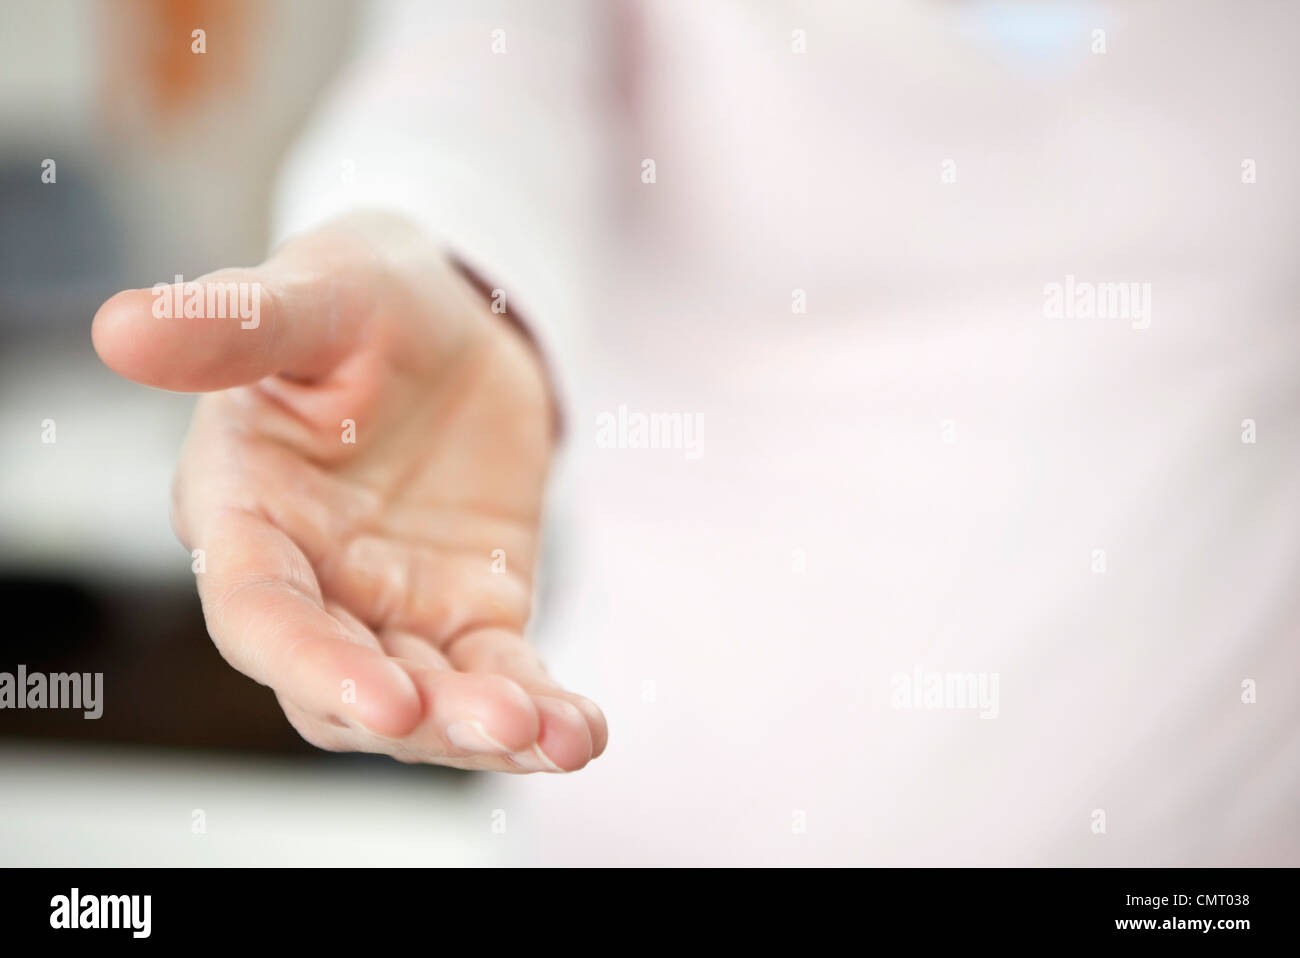 Nahaufnahme einer Person hält helfende hand Stockbild